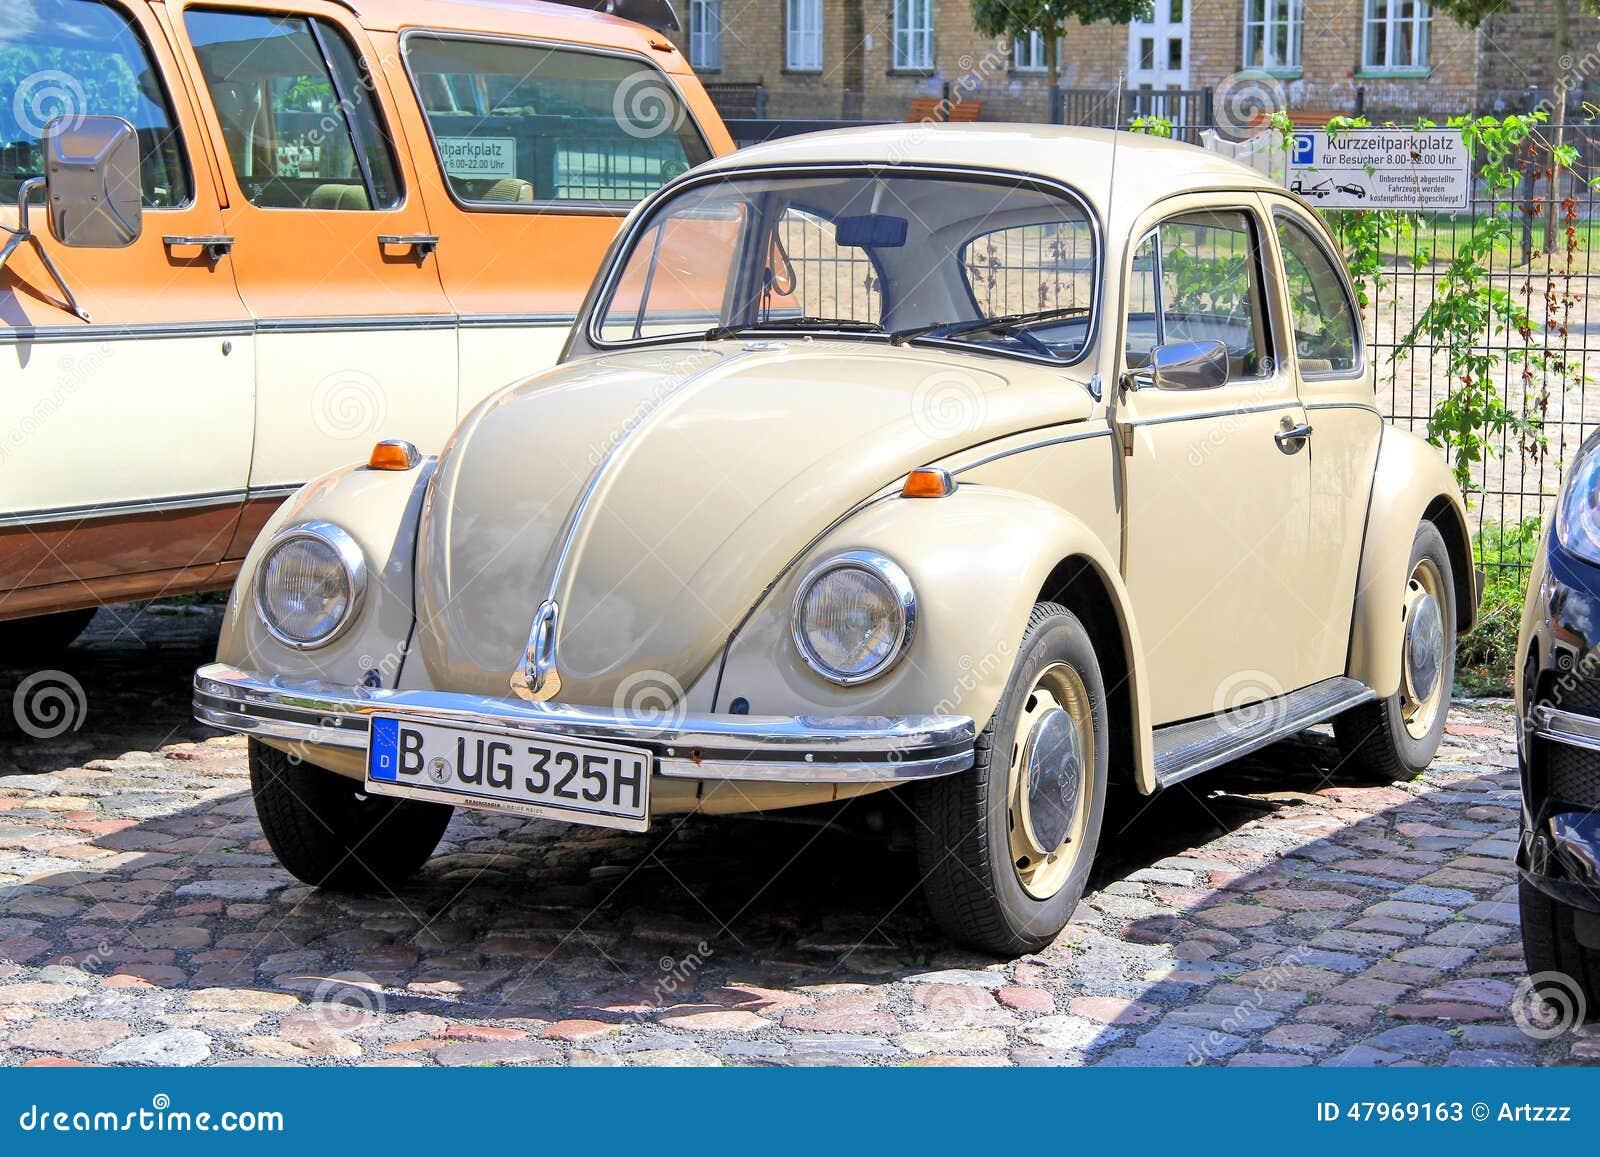 volkswagen beetle editorial stock photo image of minicar. Black Bedroom Furniture Sets. Home Design Ideas